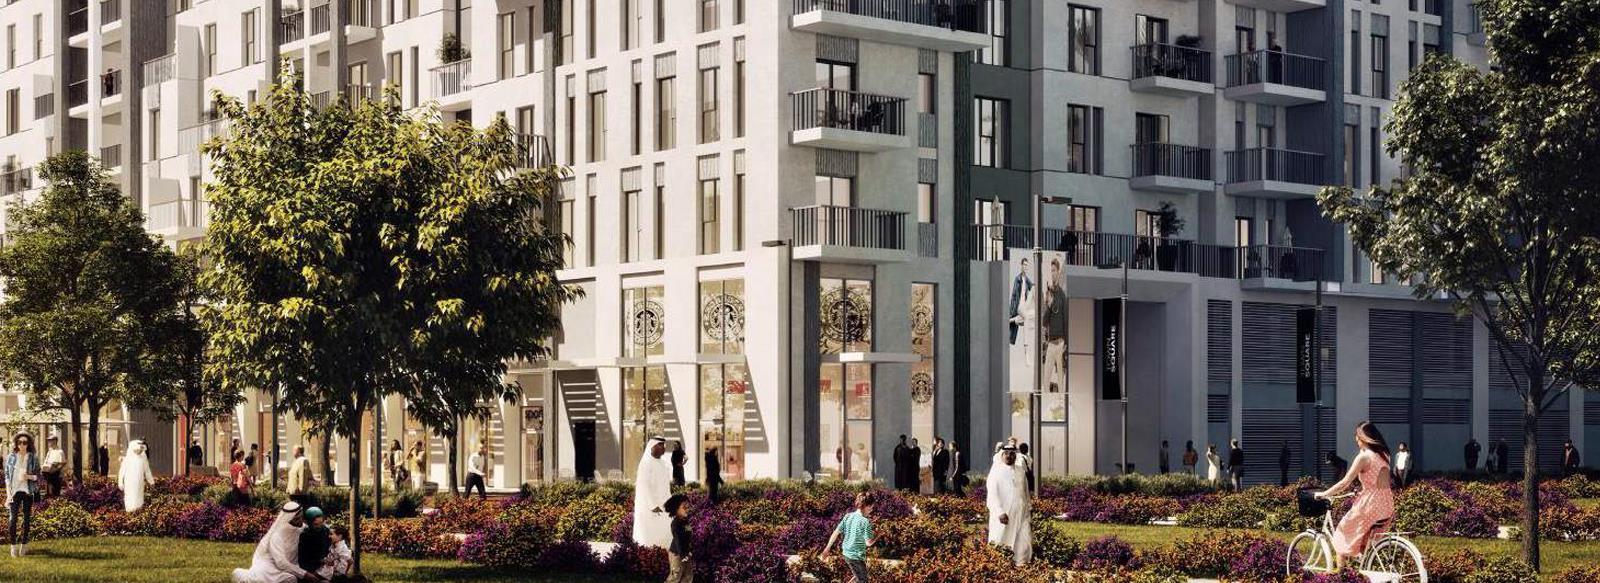 Hayat Boulevard Apartments